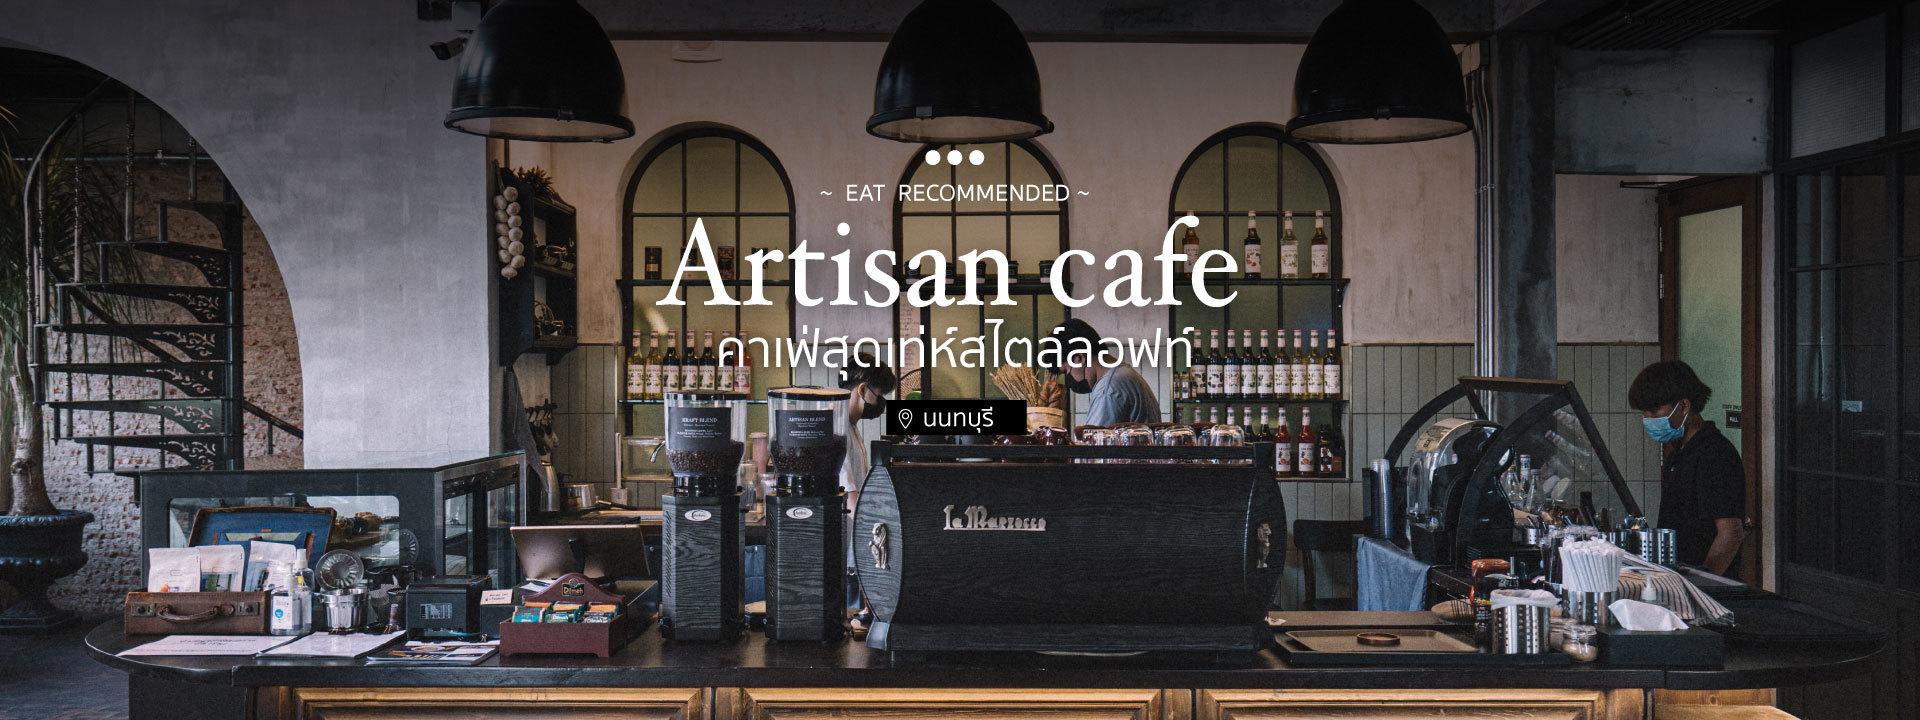 Artisan cafe cover 1920x720